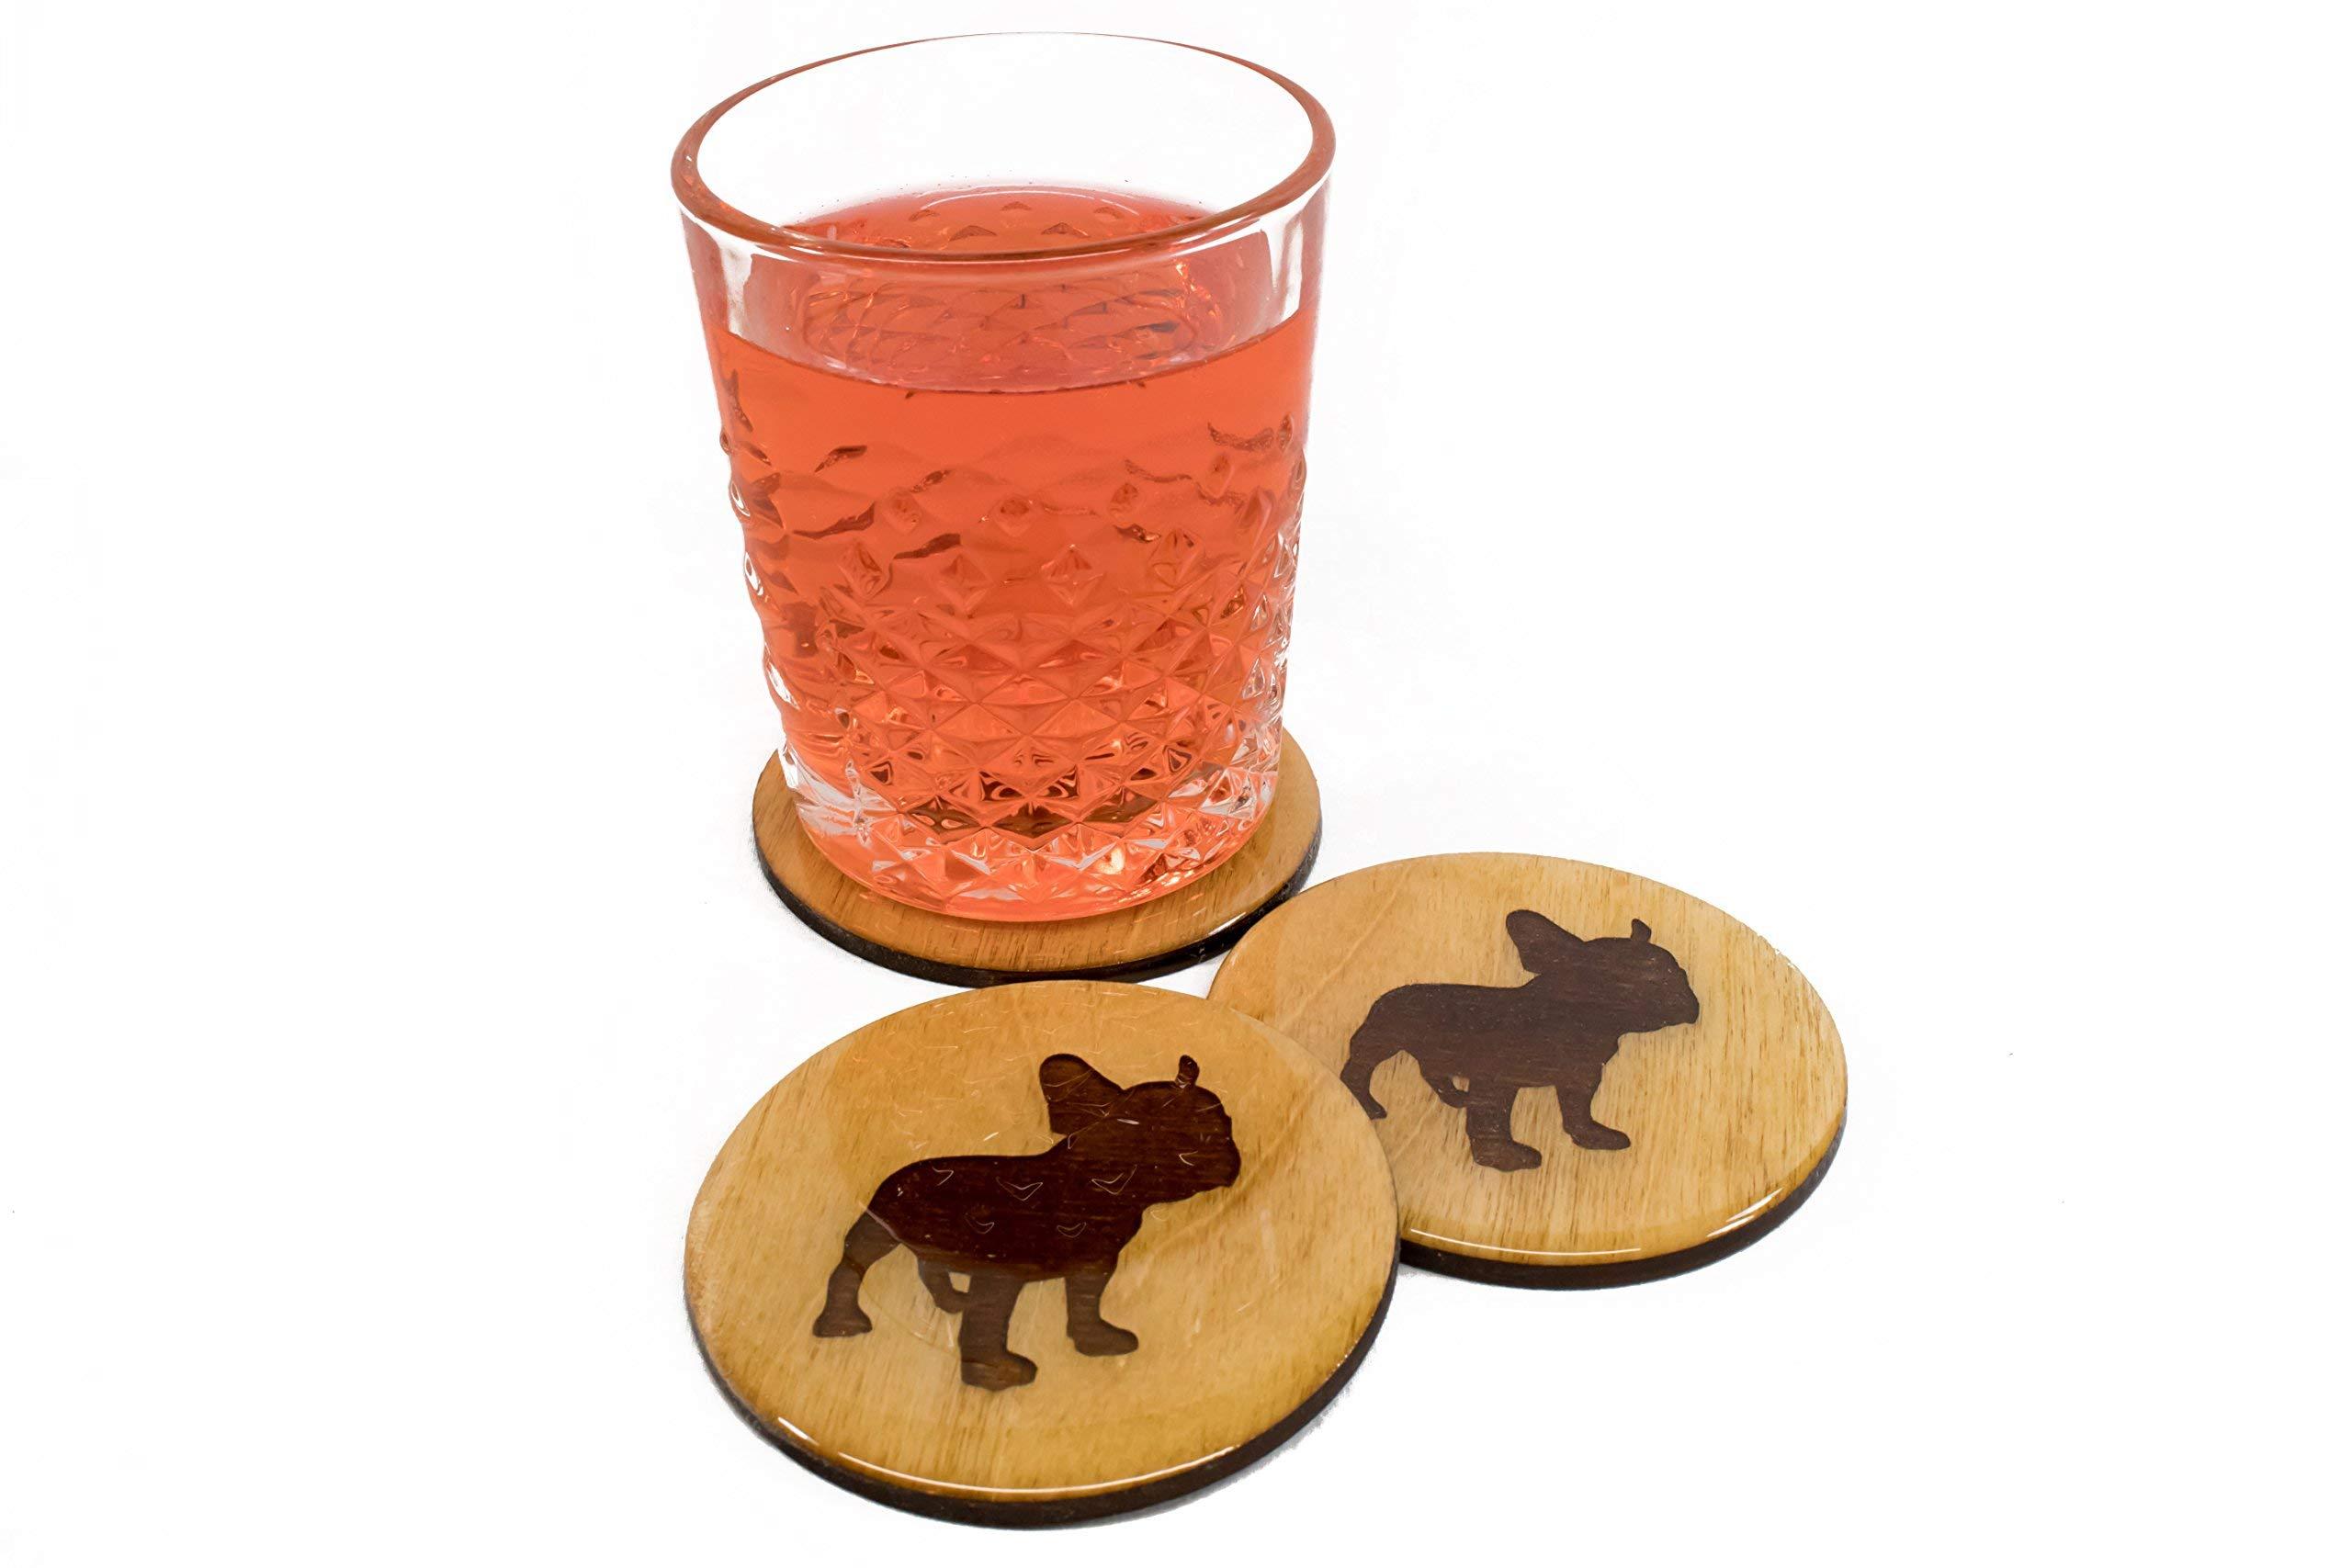 Premium French Bulldog Coasters - Set of 4 Handmade 3.5'' Wooden Gift Set